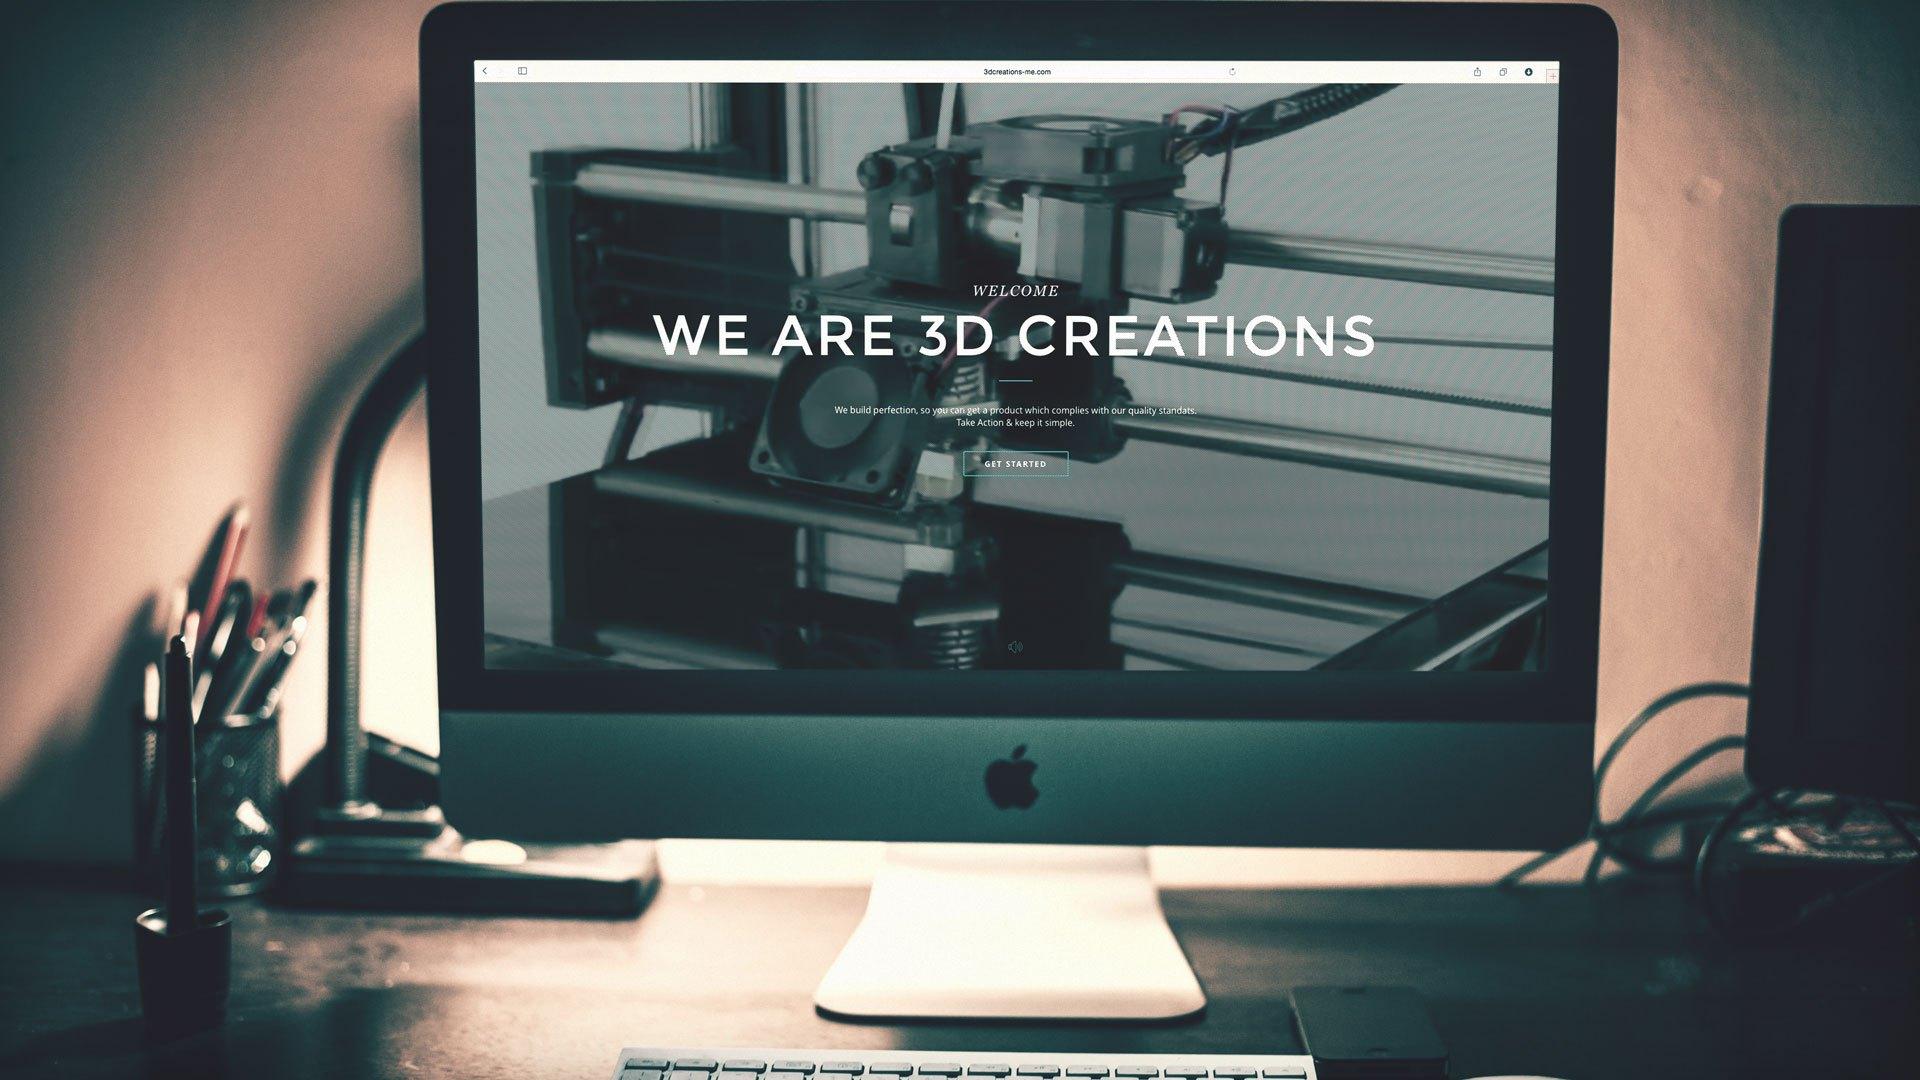 3d-creations-website-1